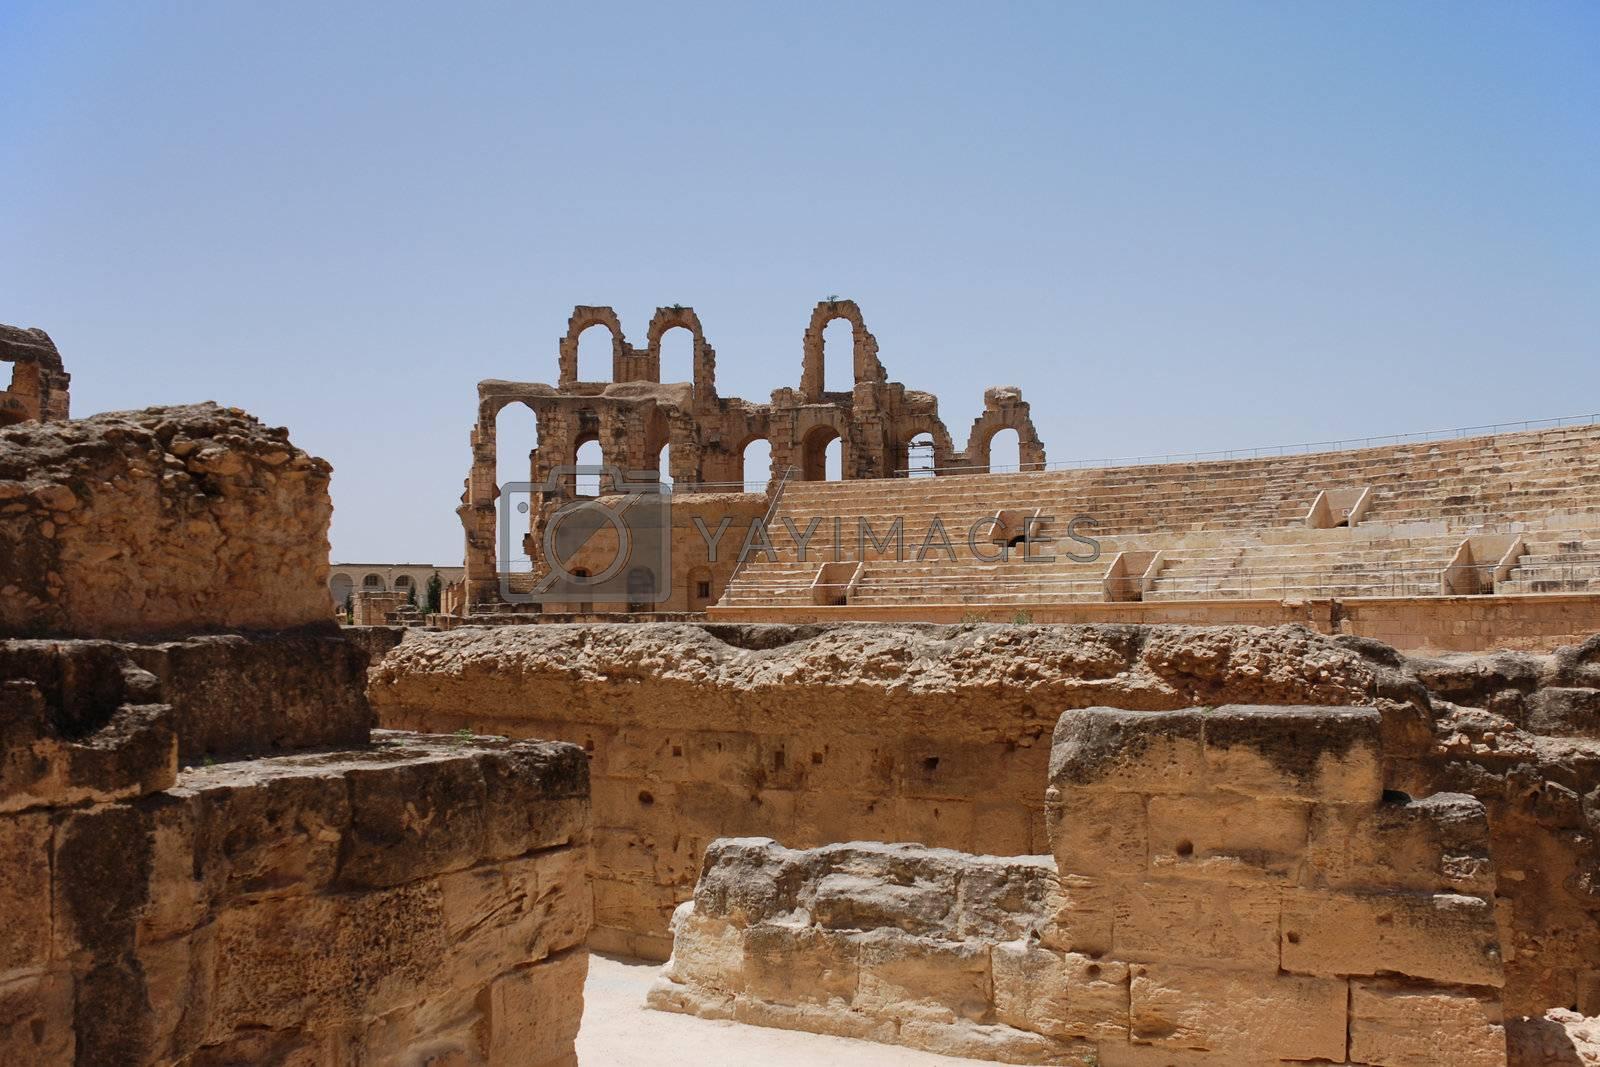 Ruins of Roman Amphitheater in El-Jem, Tunisia (UNESCO World Heritage)